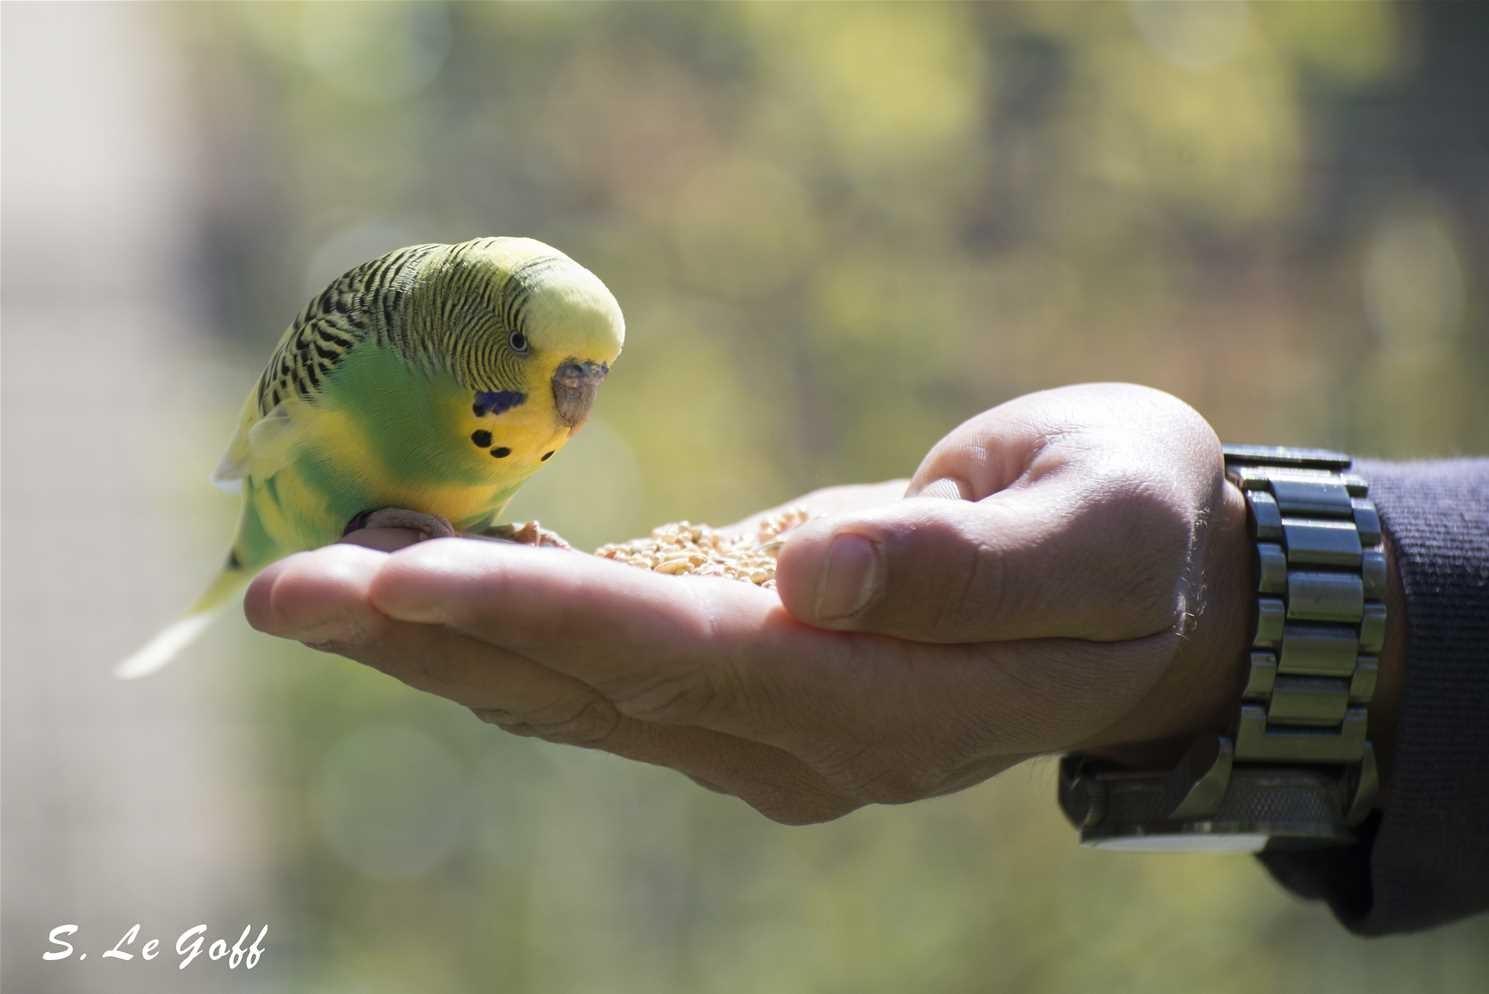 Perruche dans la main